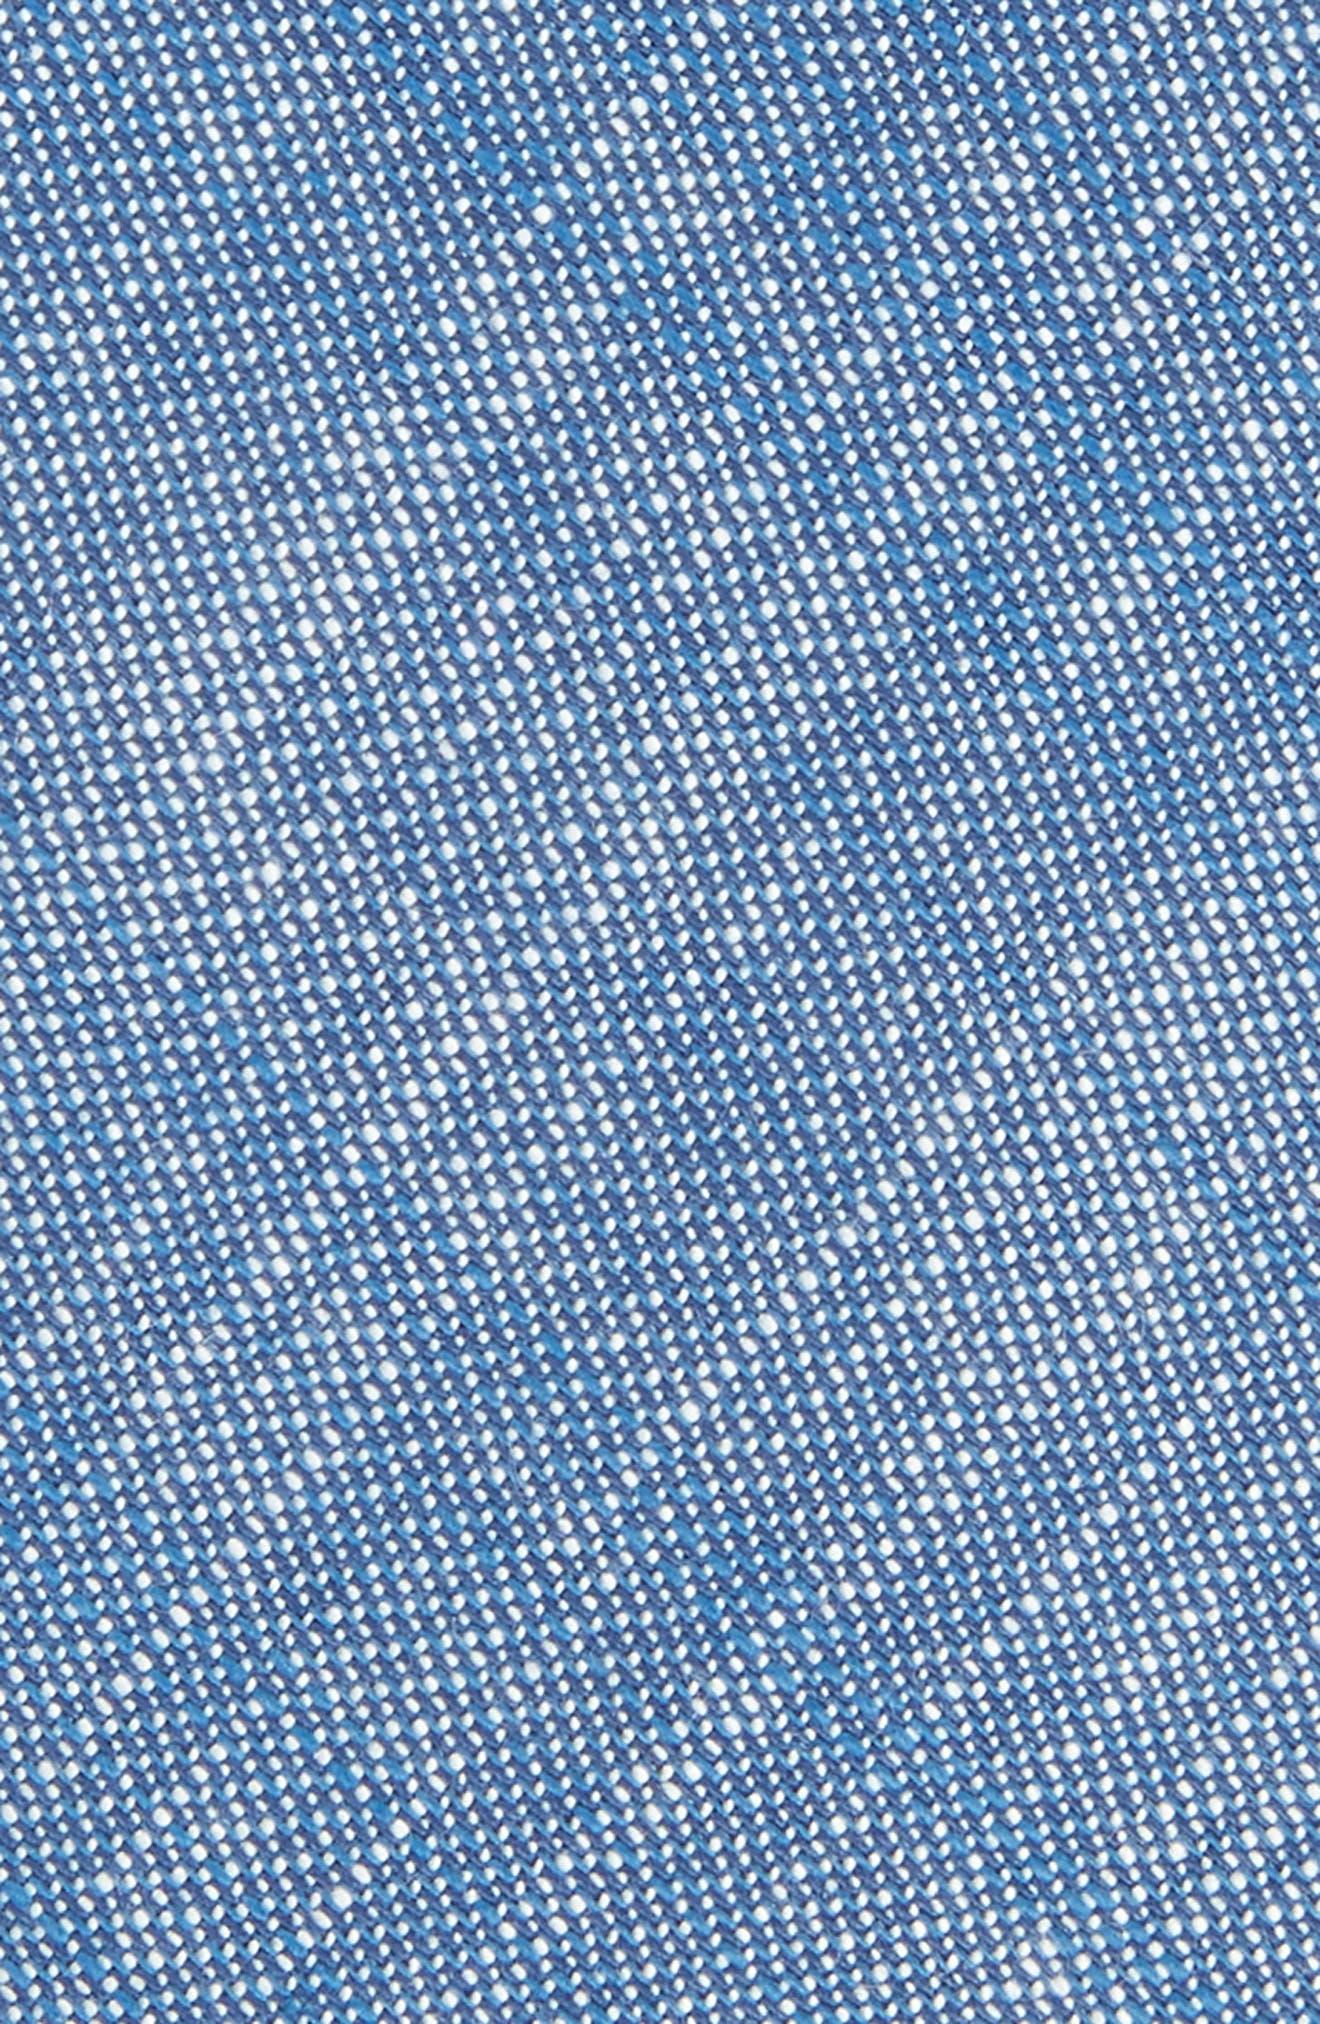 Alternate Image 2  - Nordstrom Men's Shop Tyler Solid Cotton Skinny Tie